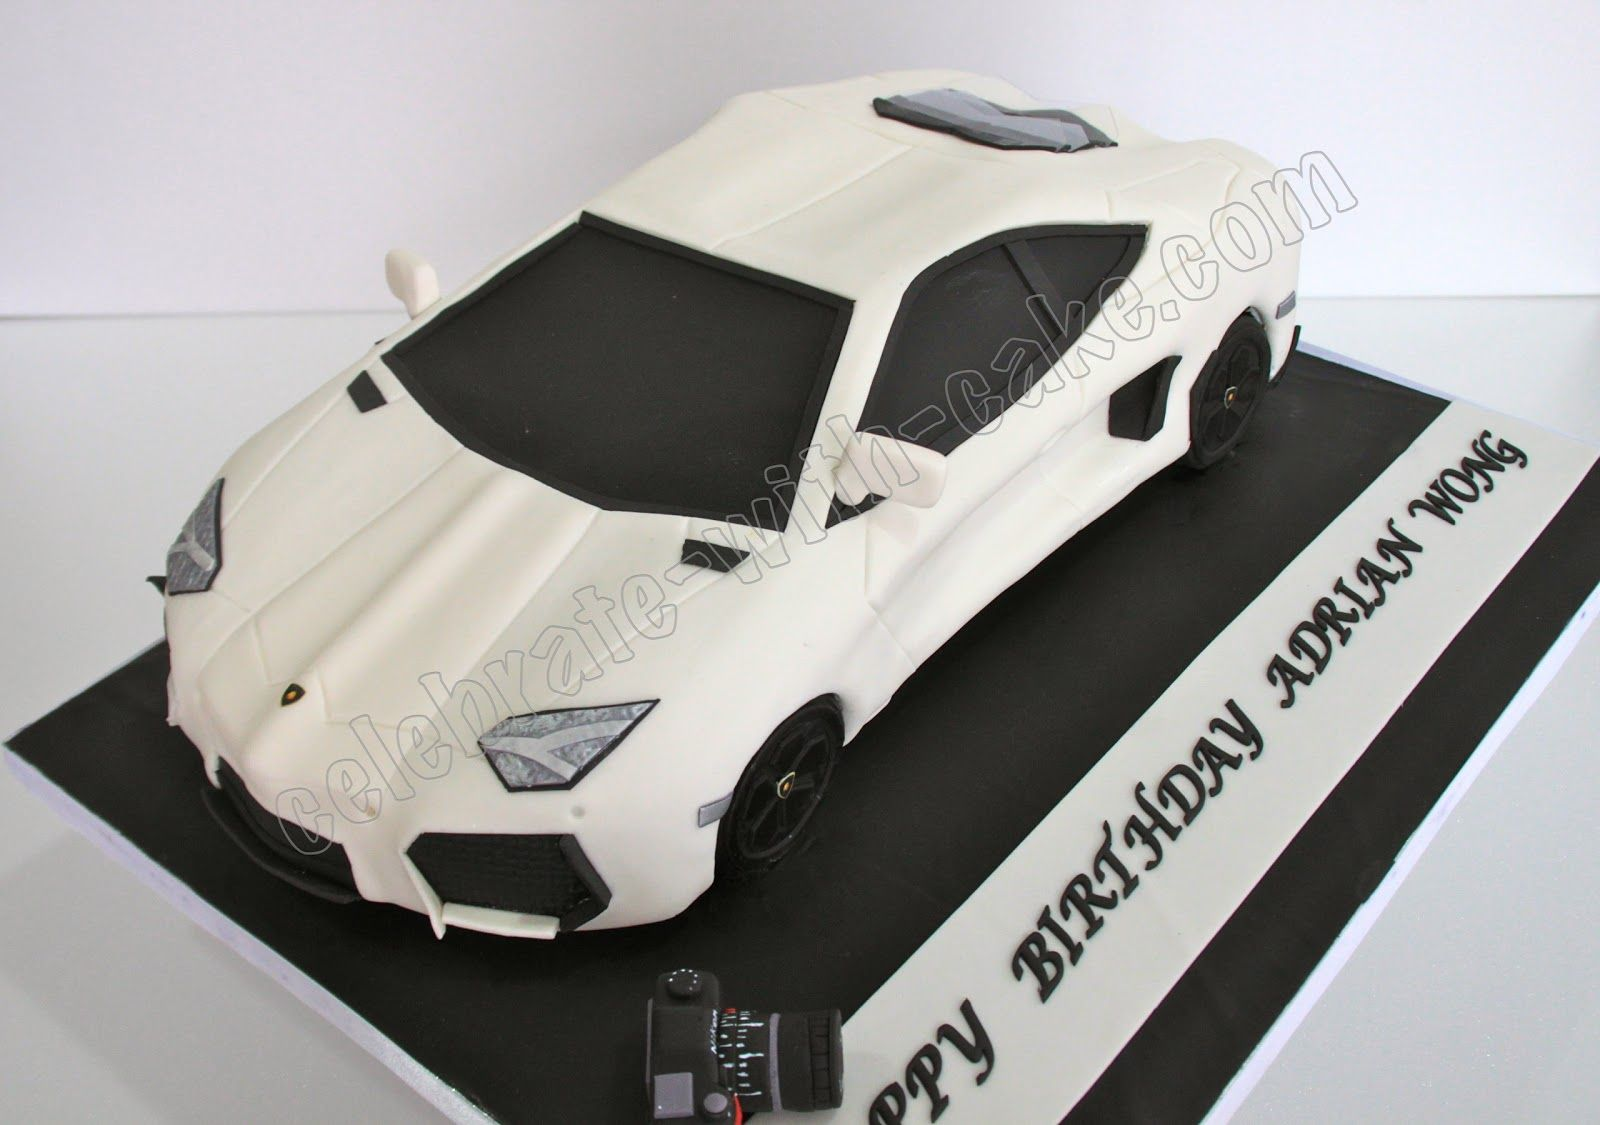 Lamborghini aventador super car cake alexrose73 cakes lamborghini aventador super car cake alexrose73 cakes pinterest car cakes super car and lamborghini aventador baditri Gallery